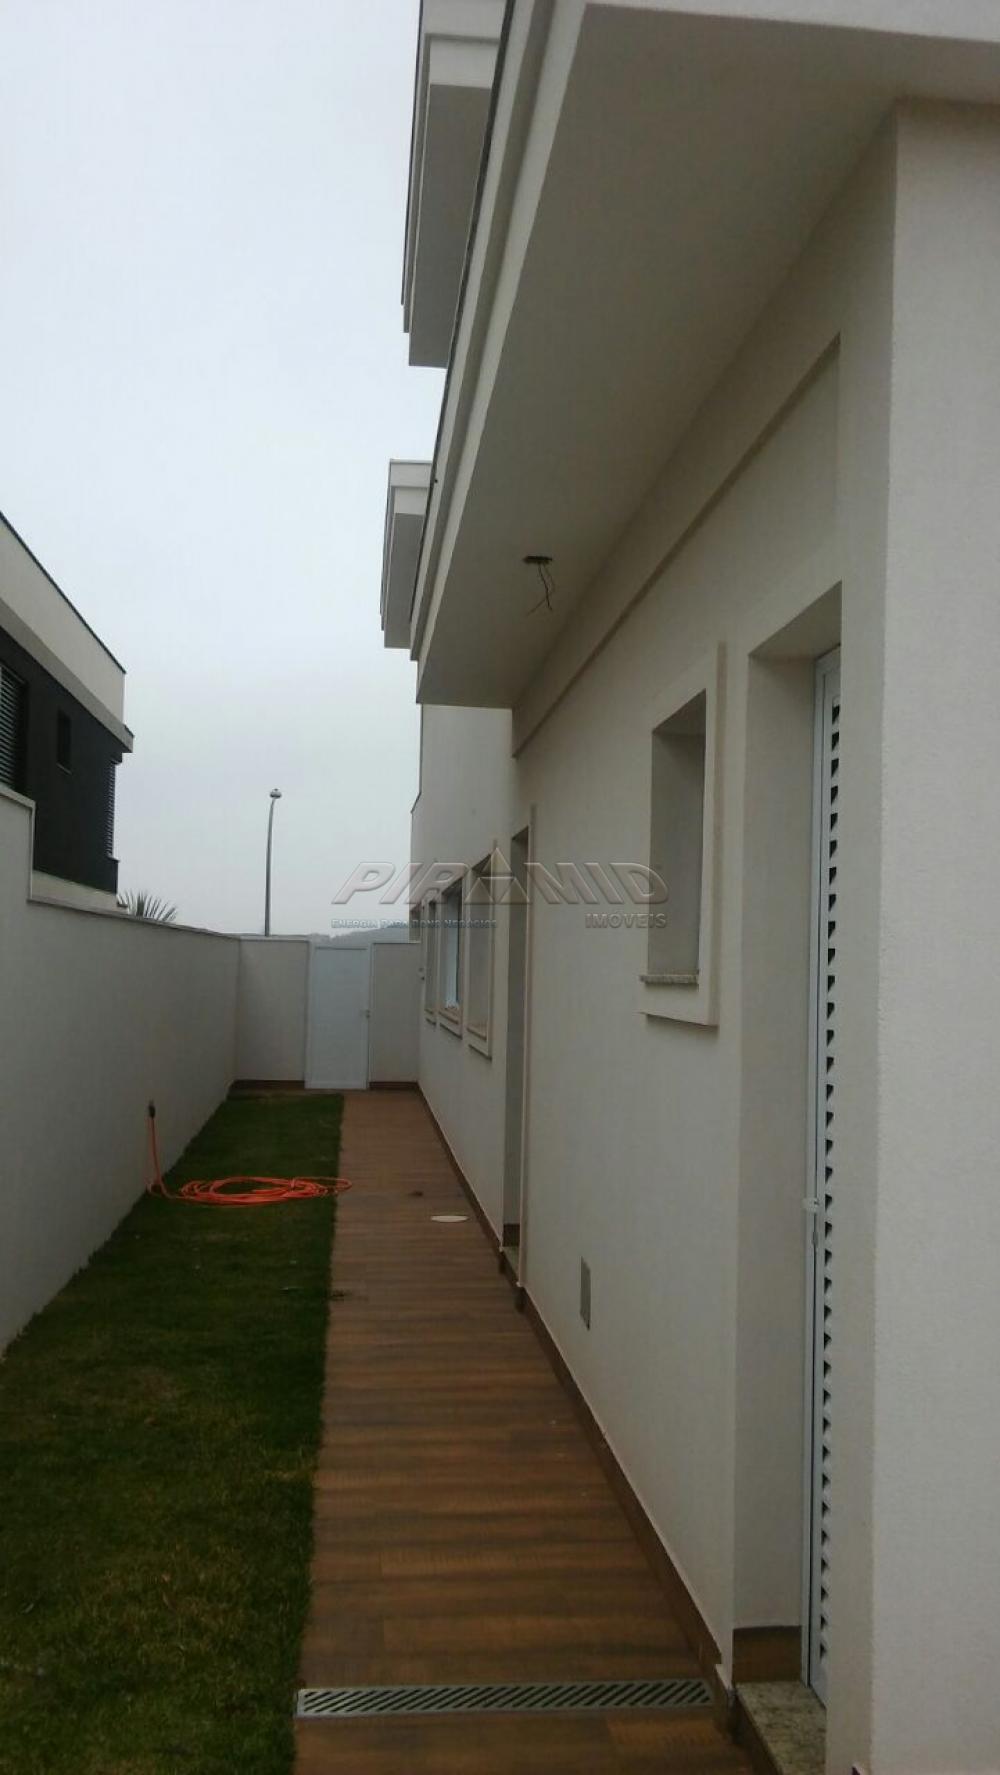 Bonfim Paulista Casa Venda R$1.650.000,00 Condominio R$500,00 4 Dormitorios 4 Suites Area do terreno 486.00m2 Area construida 368.00m2